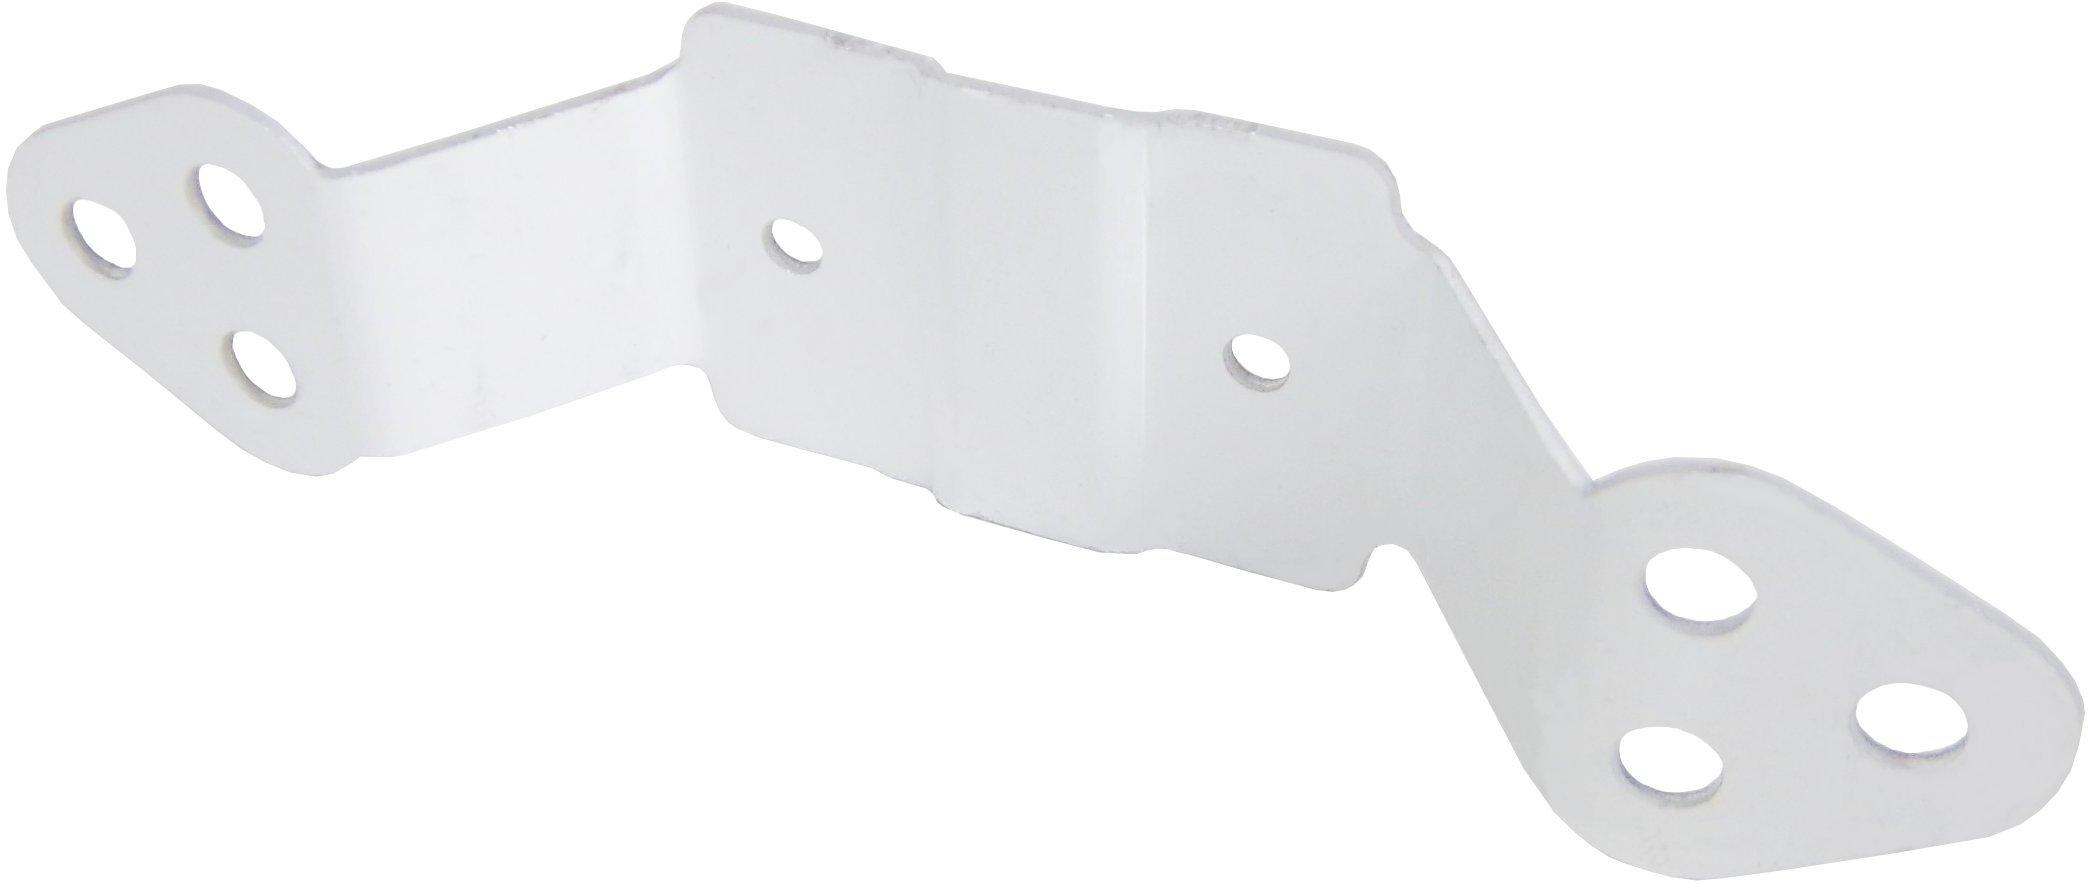 Aluminum Pipe Cleat,Gutter Brackets